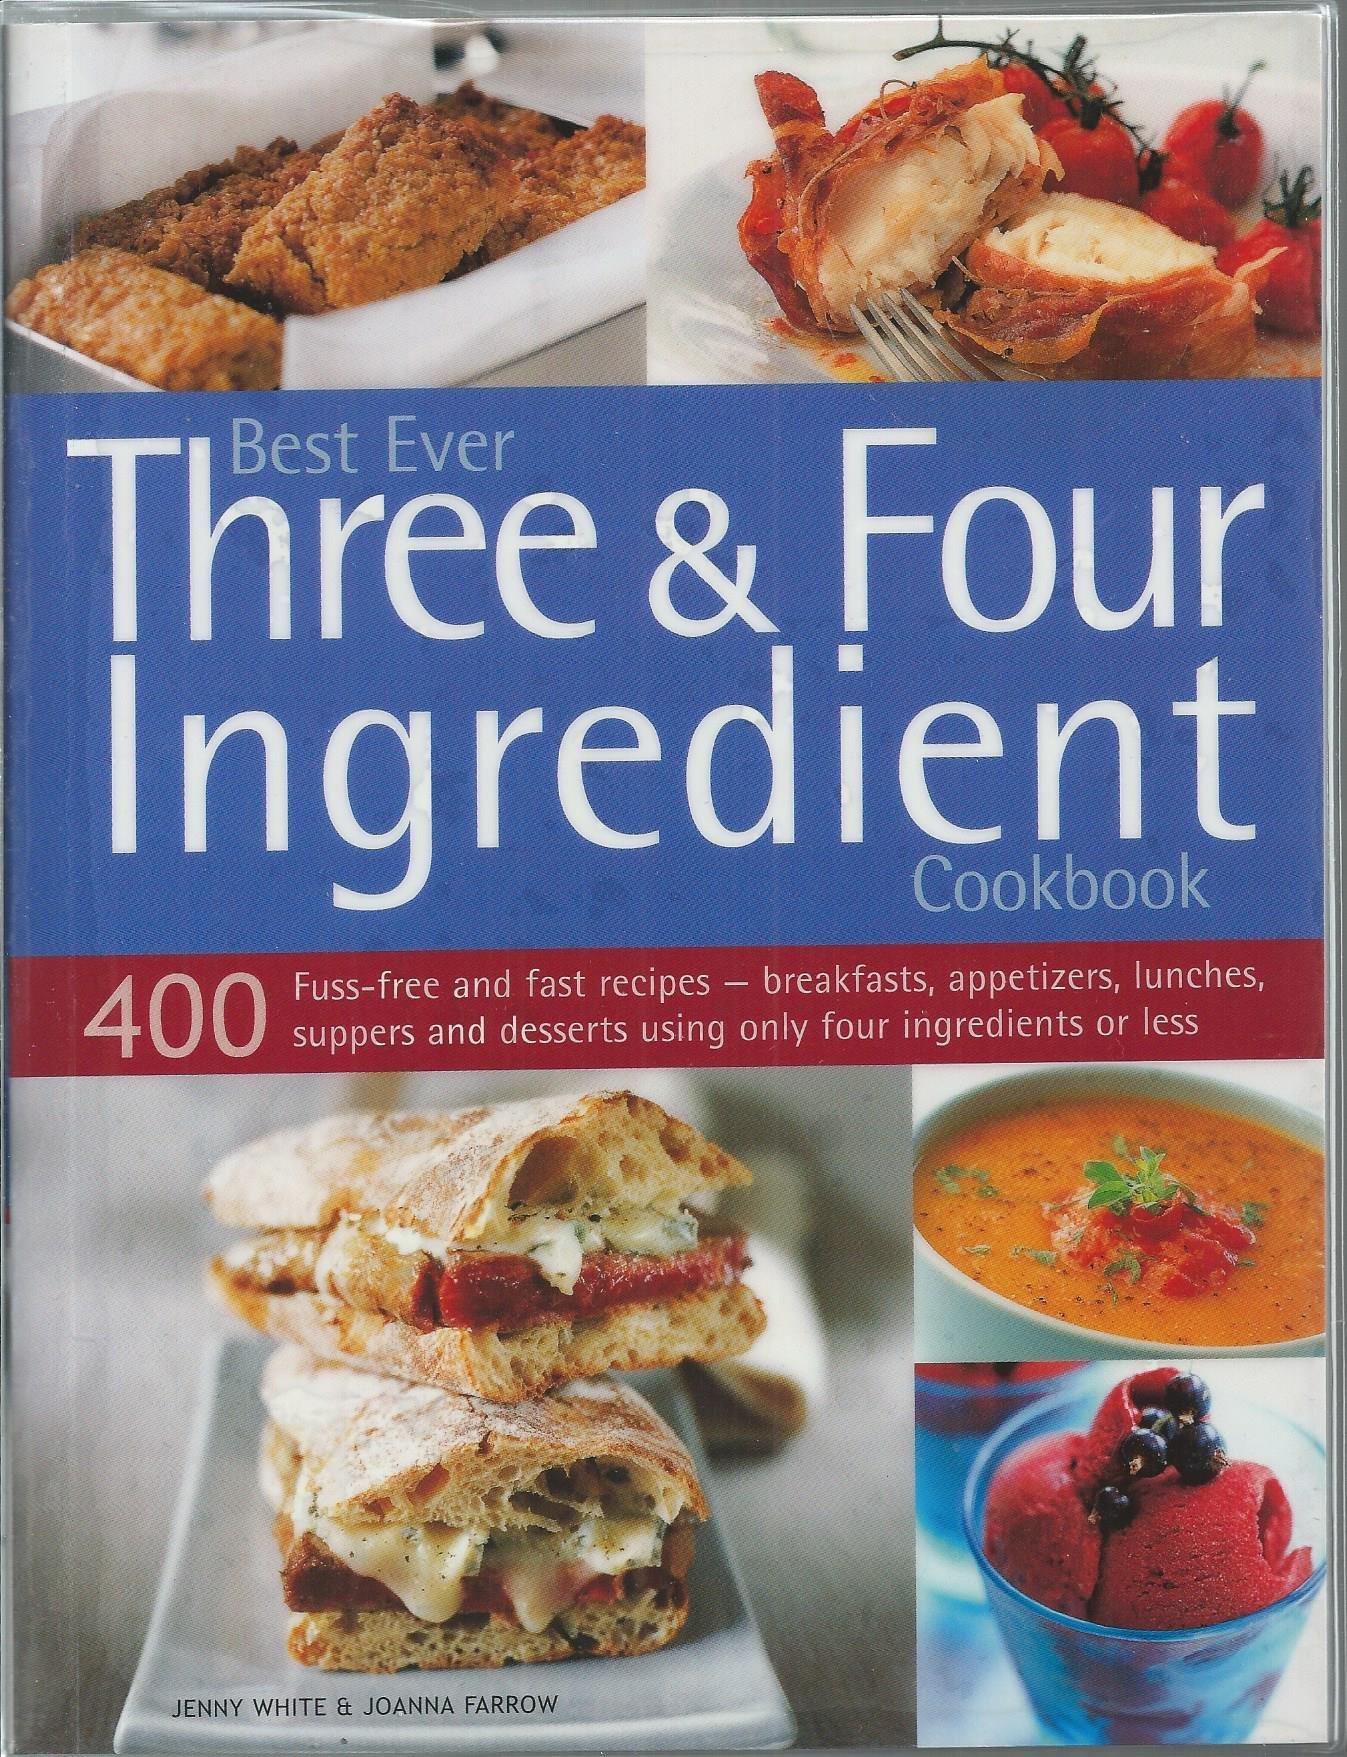 Best Ever Three Ingredient Cookbook product image